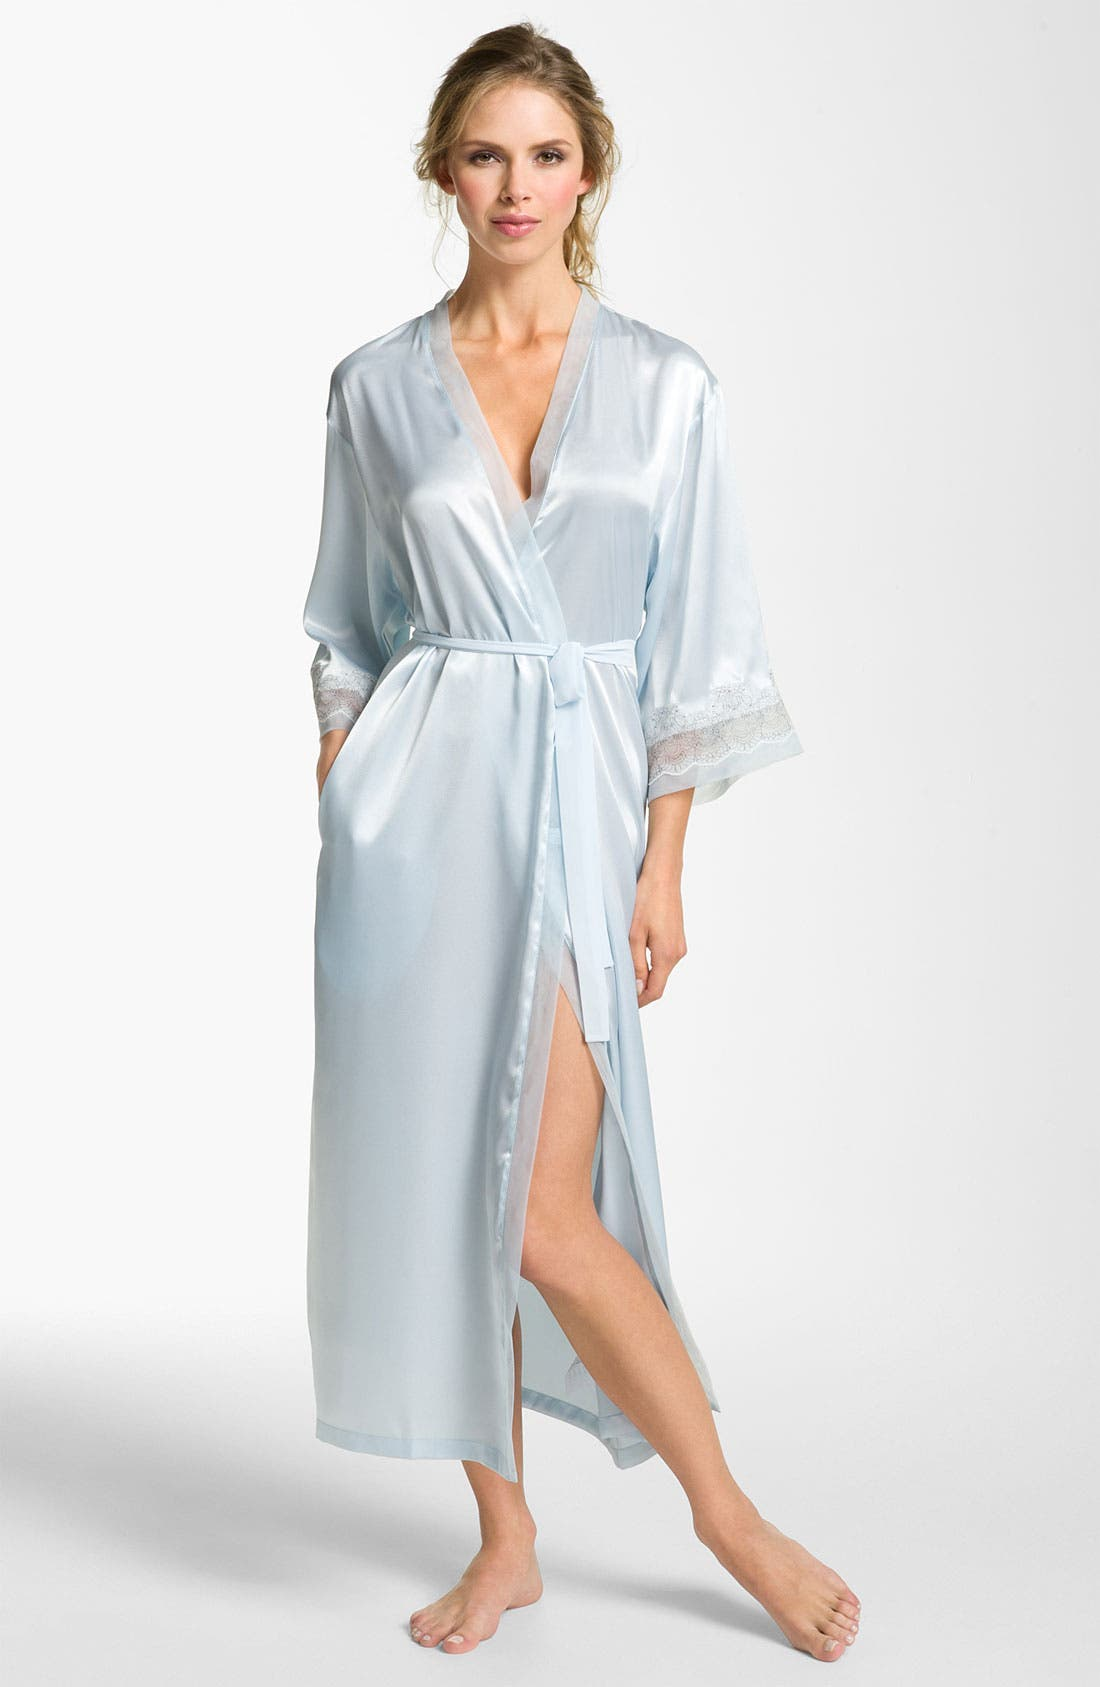 Alternate Image 1 Selected - Oscar de la Renta Sleepwear 'Elegant' Satin Robe